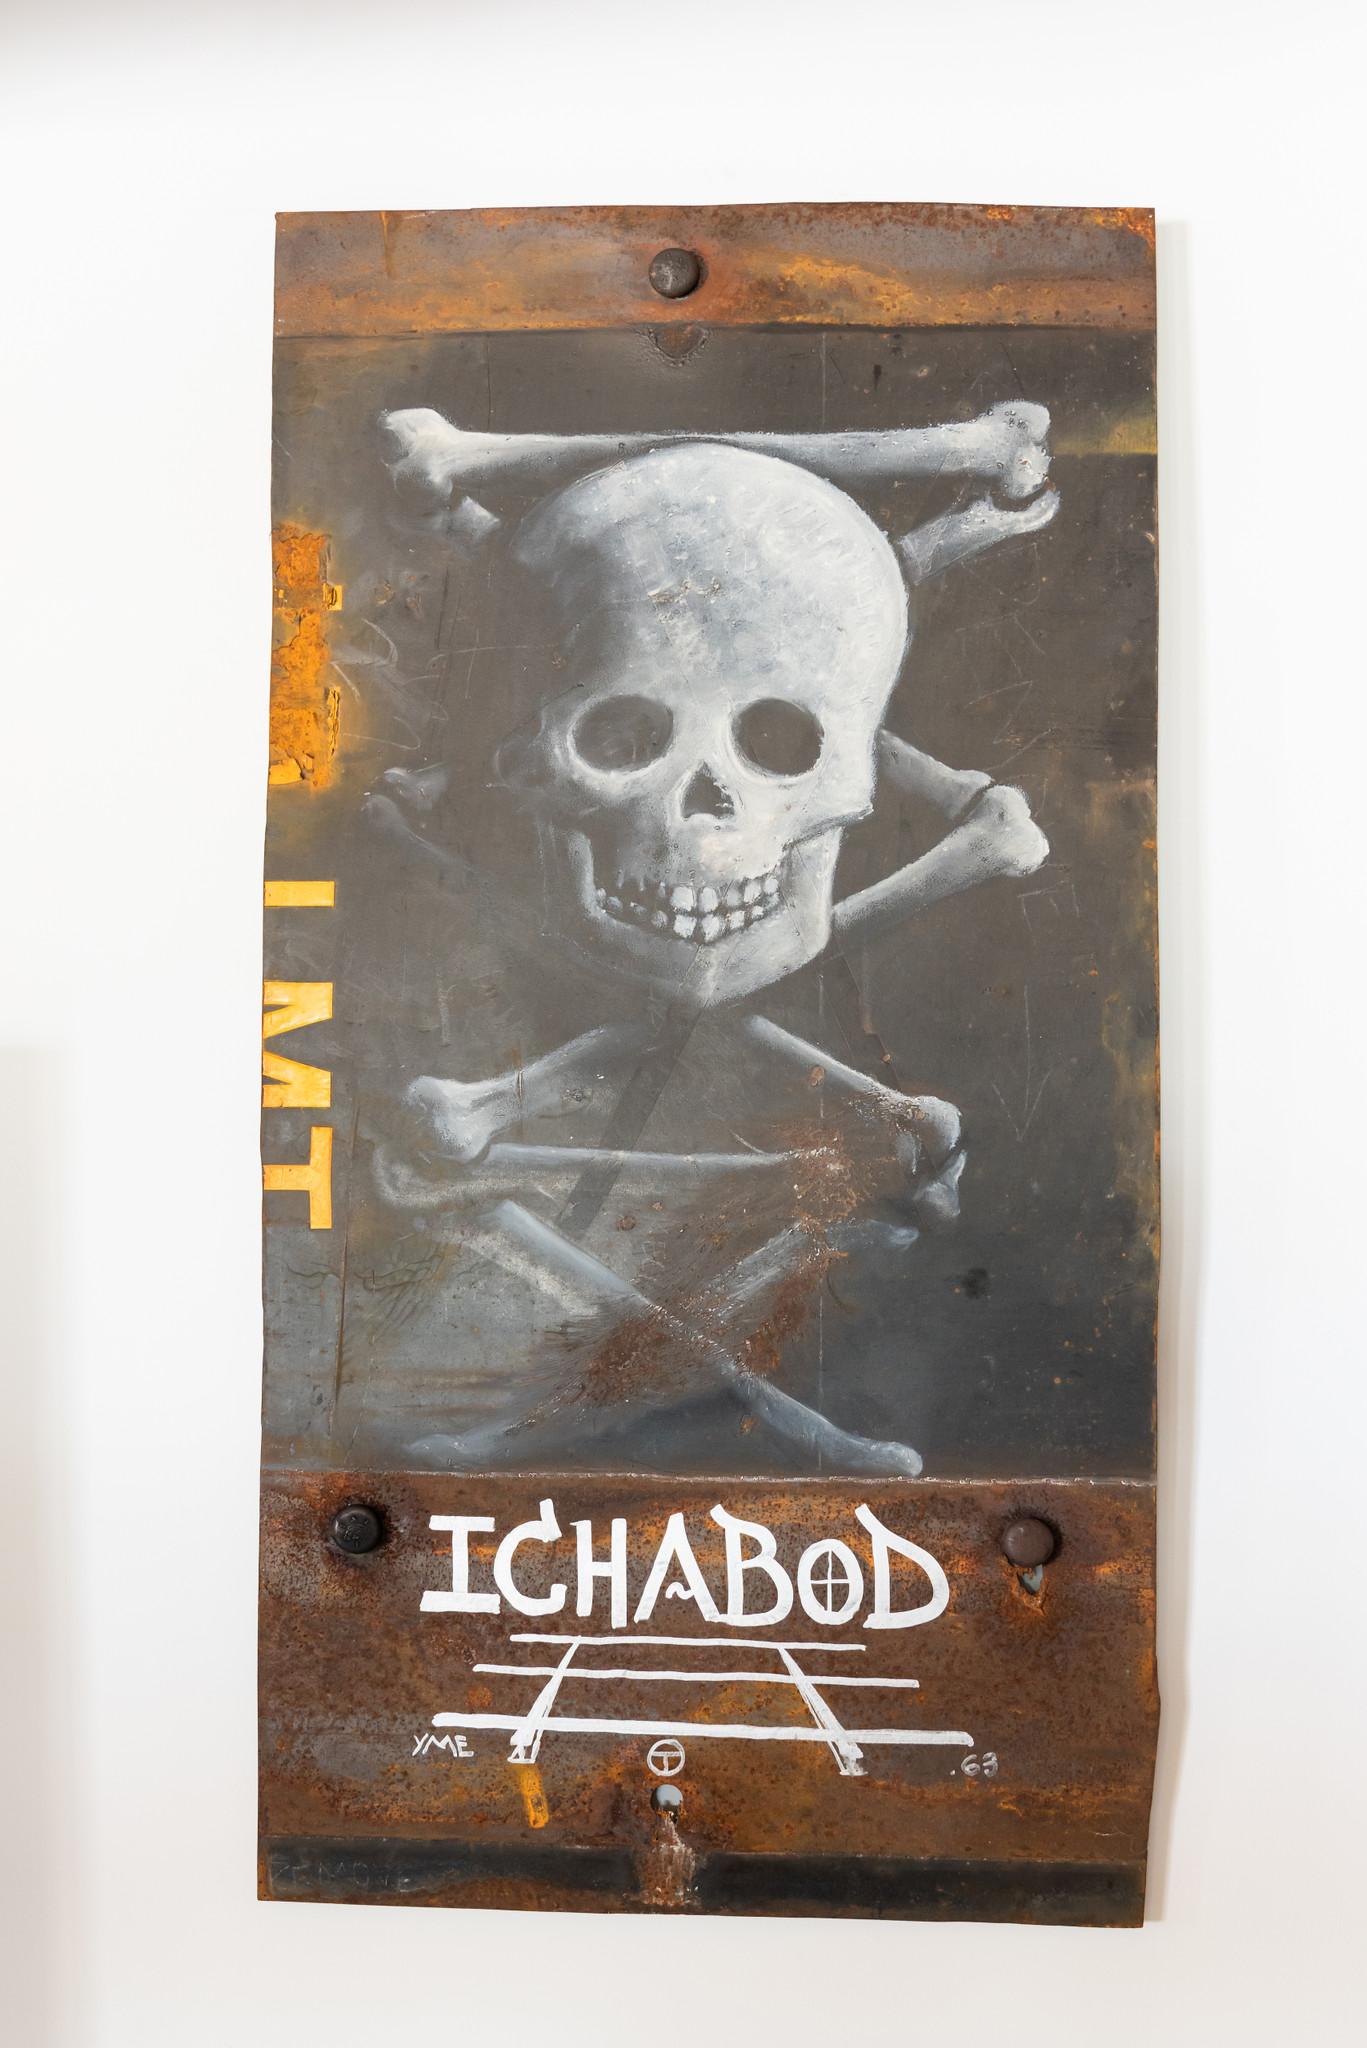 Urban rustic oil bar skull and bones train track graffiti